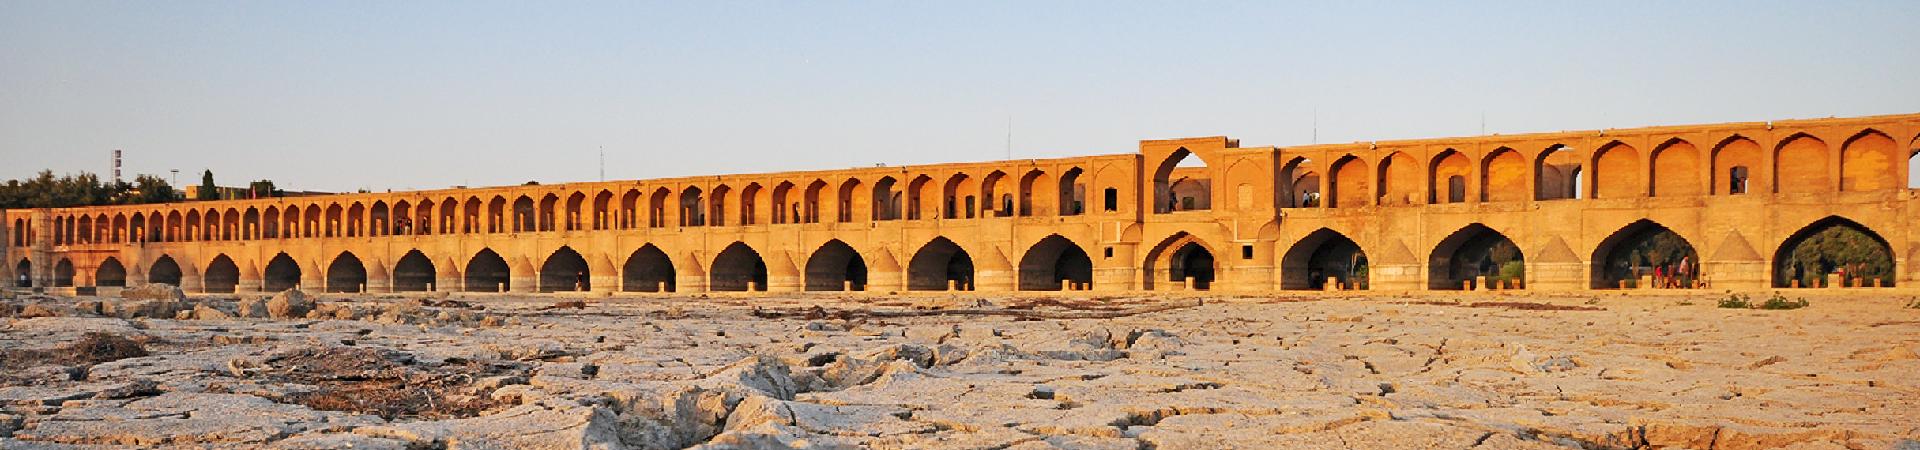 Titelbeild-Isfahan-Allah-Masala_26-07-2017_2b73d